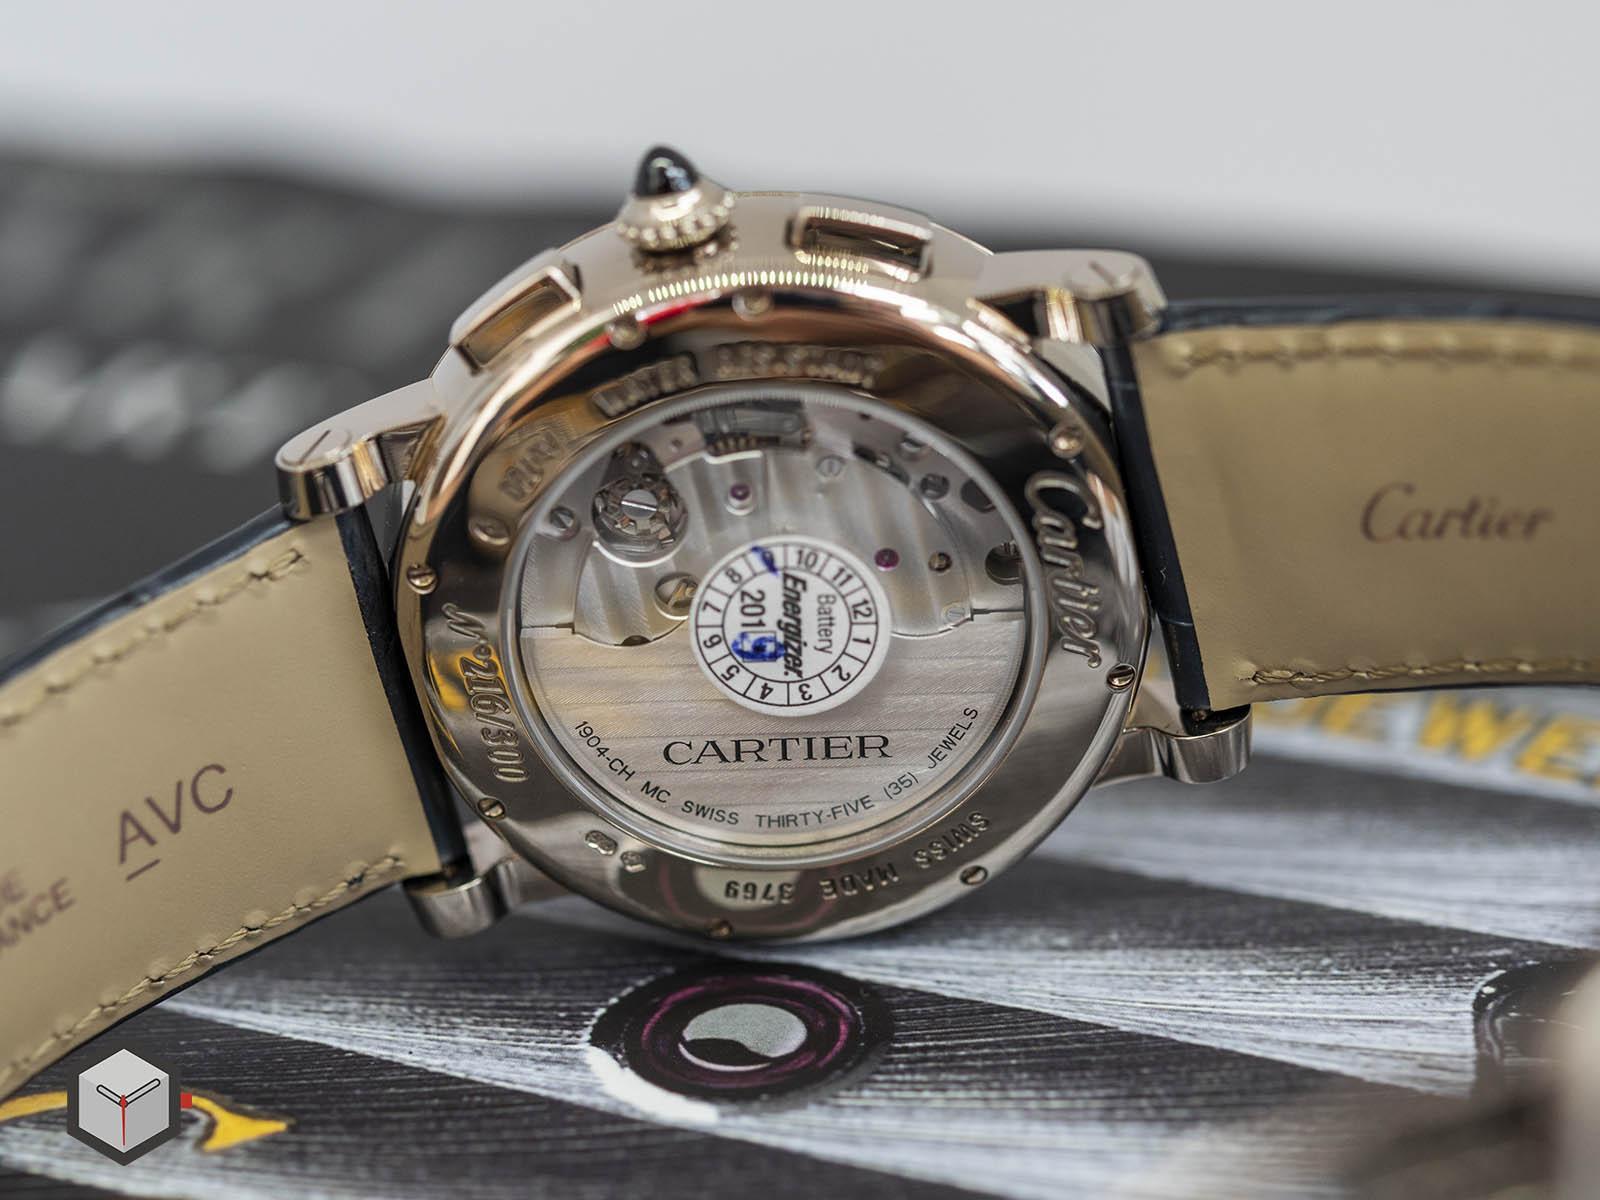 cartier-rotonde-de-cartier-chronograph-limited-edition-8.jpg